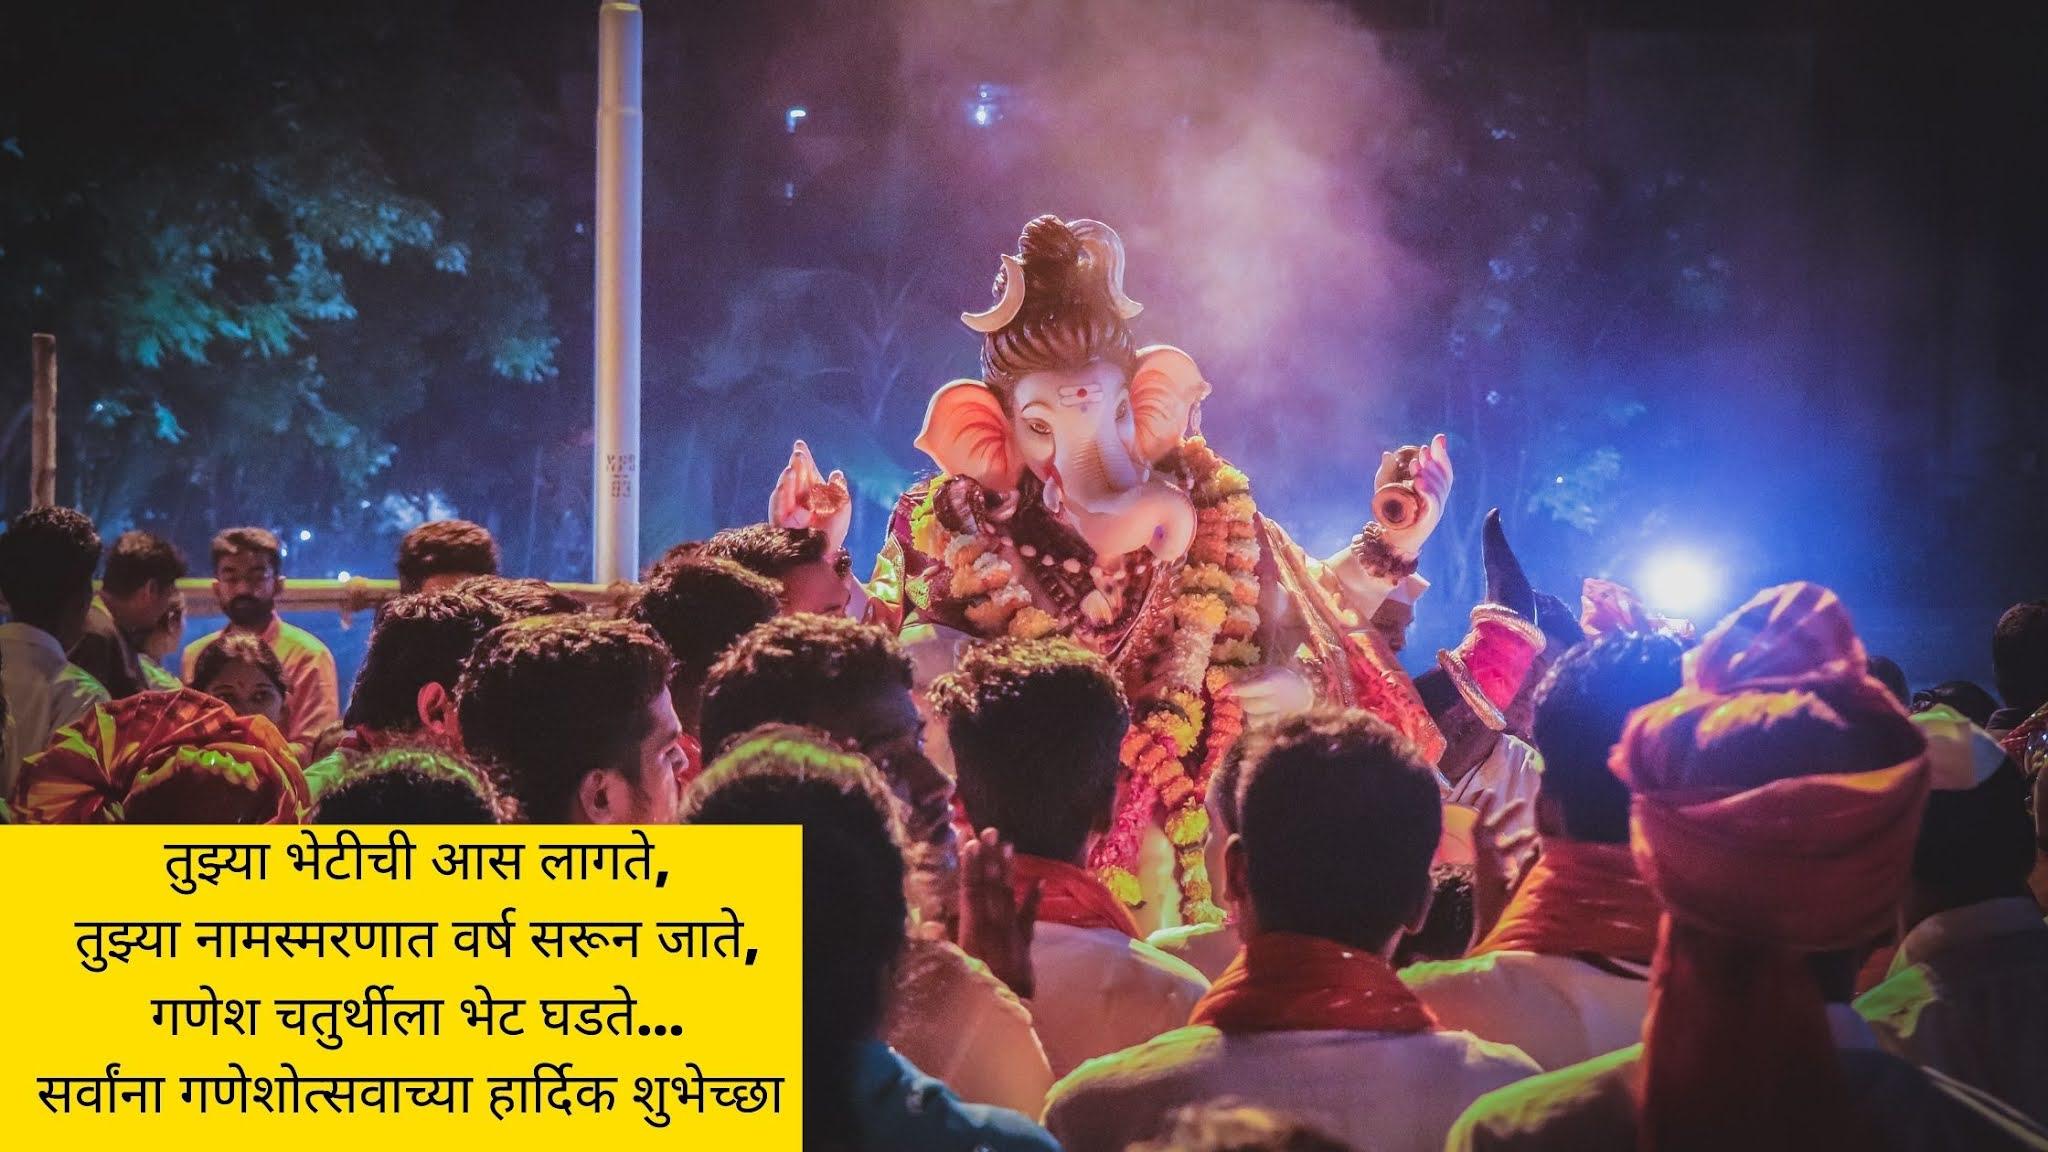 ganesh-chaturthi-wishes-in-Marathi